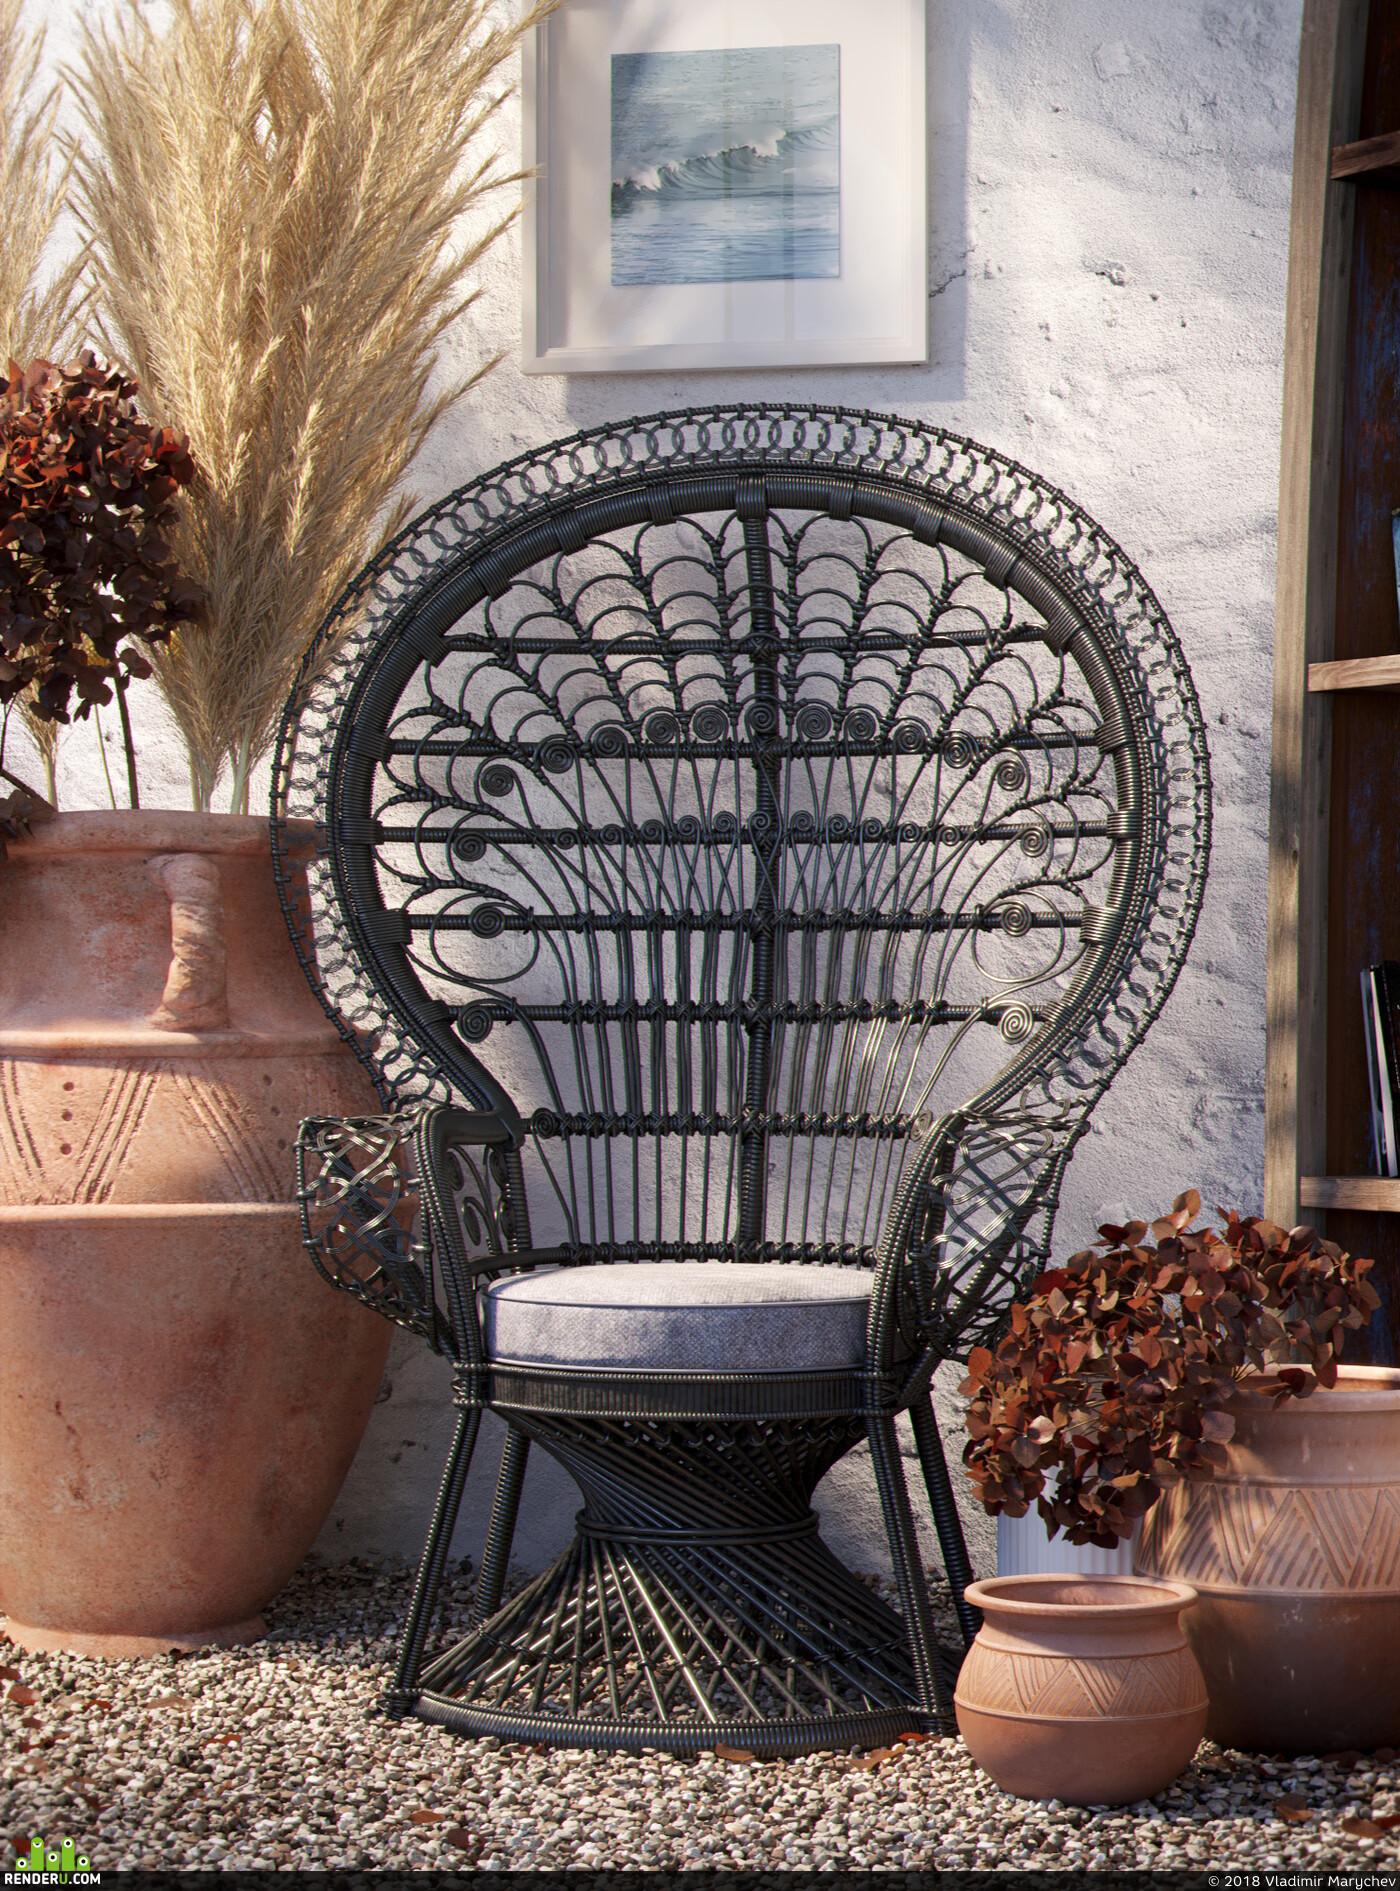 interior design, ZBrush, Marvelous designer, foliage, scatter, 3ds Max